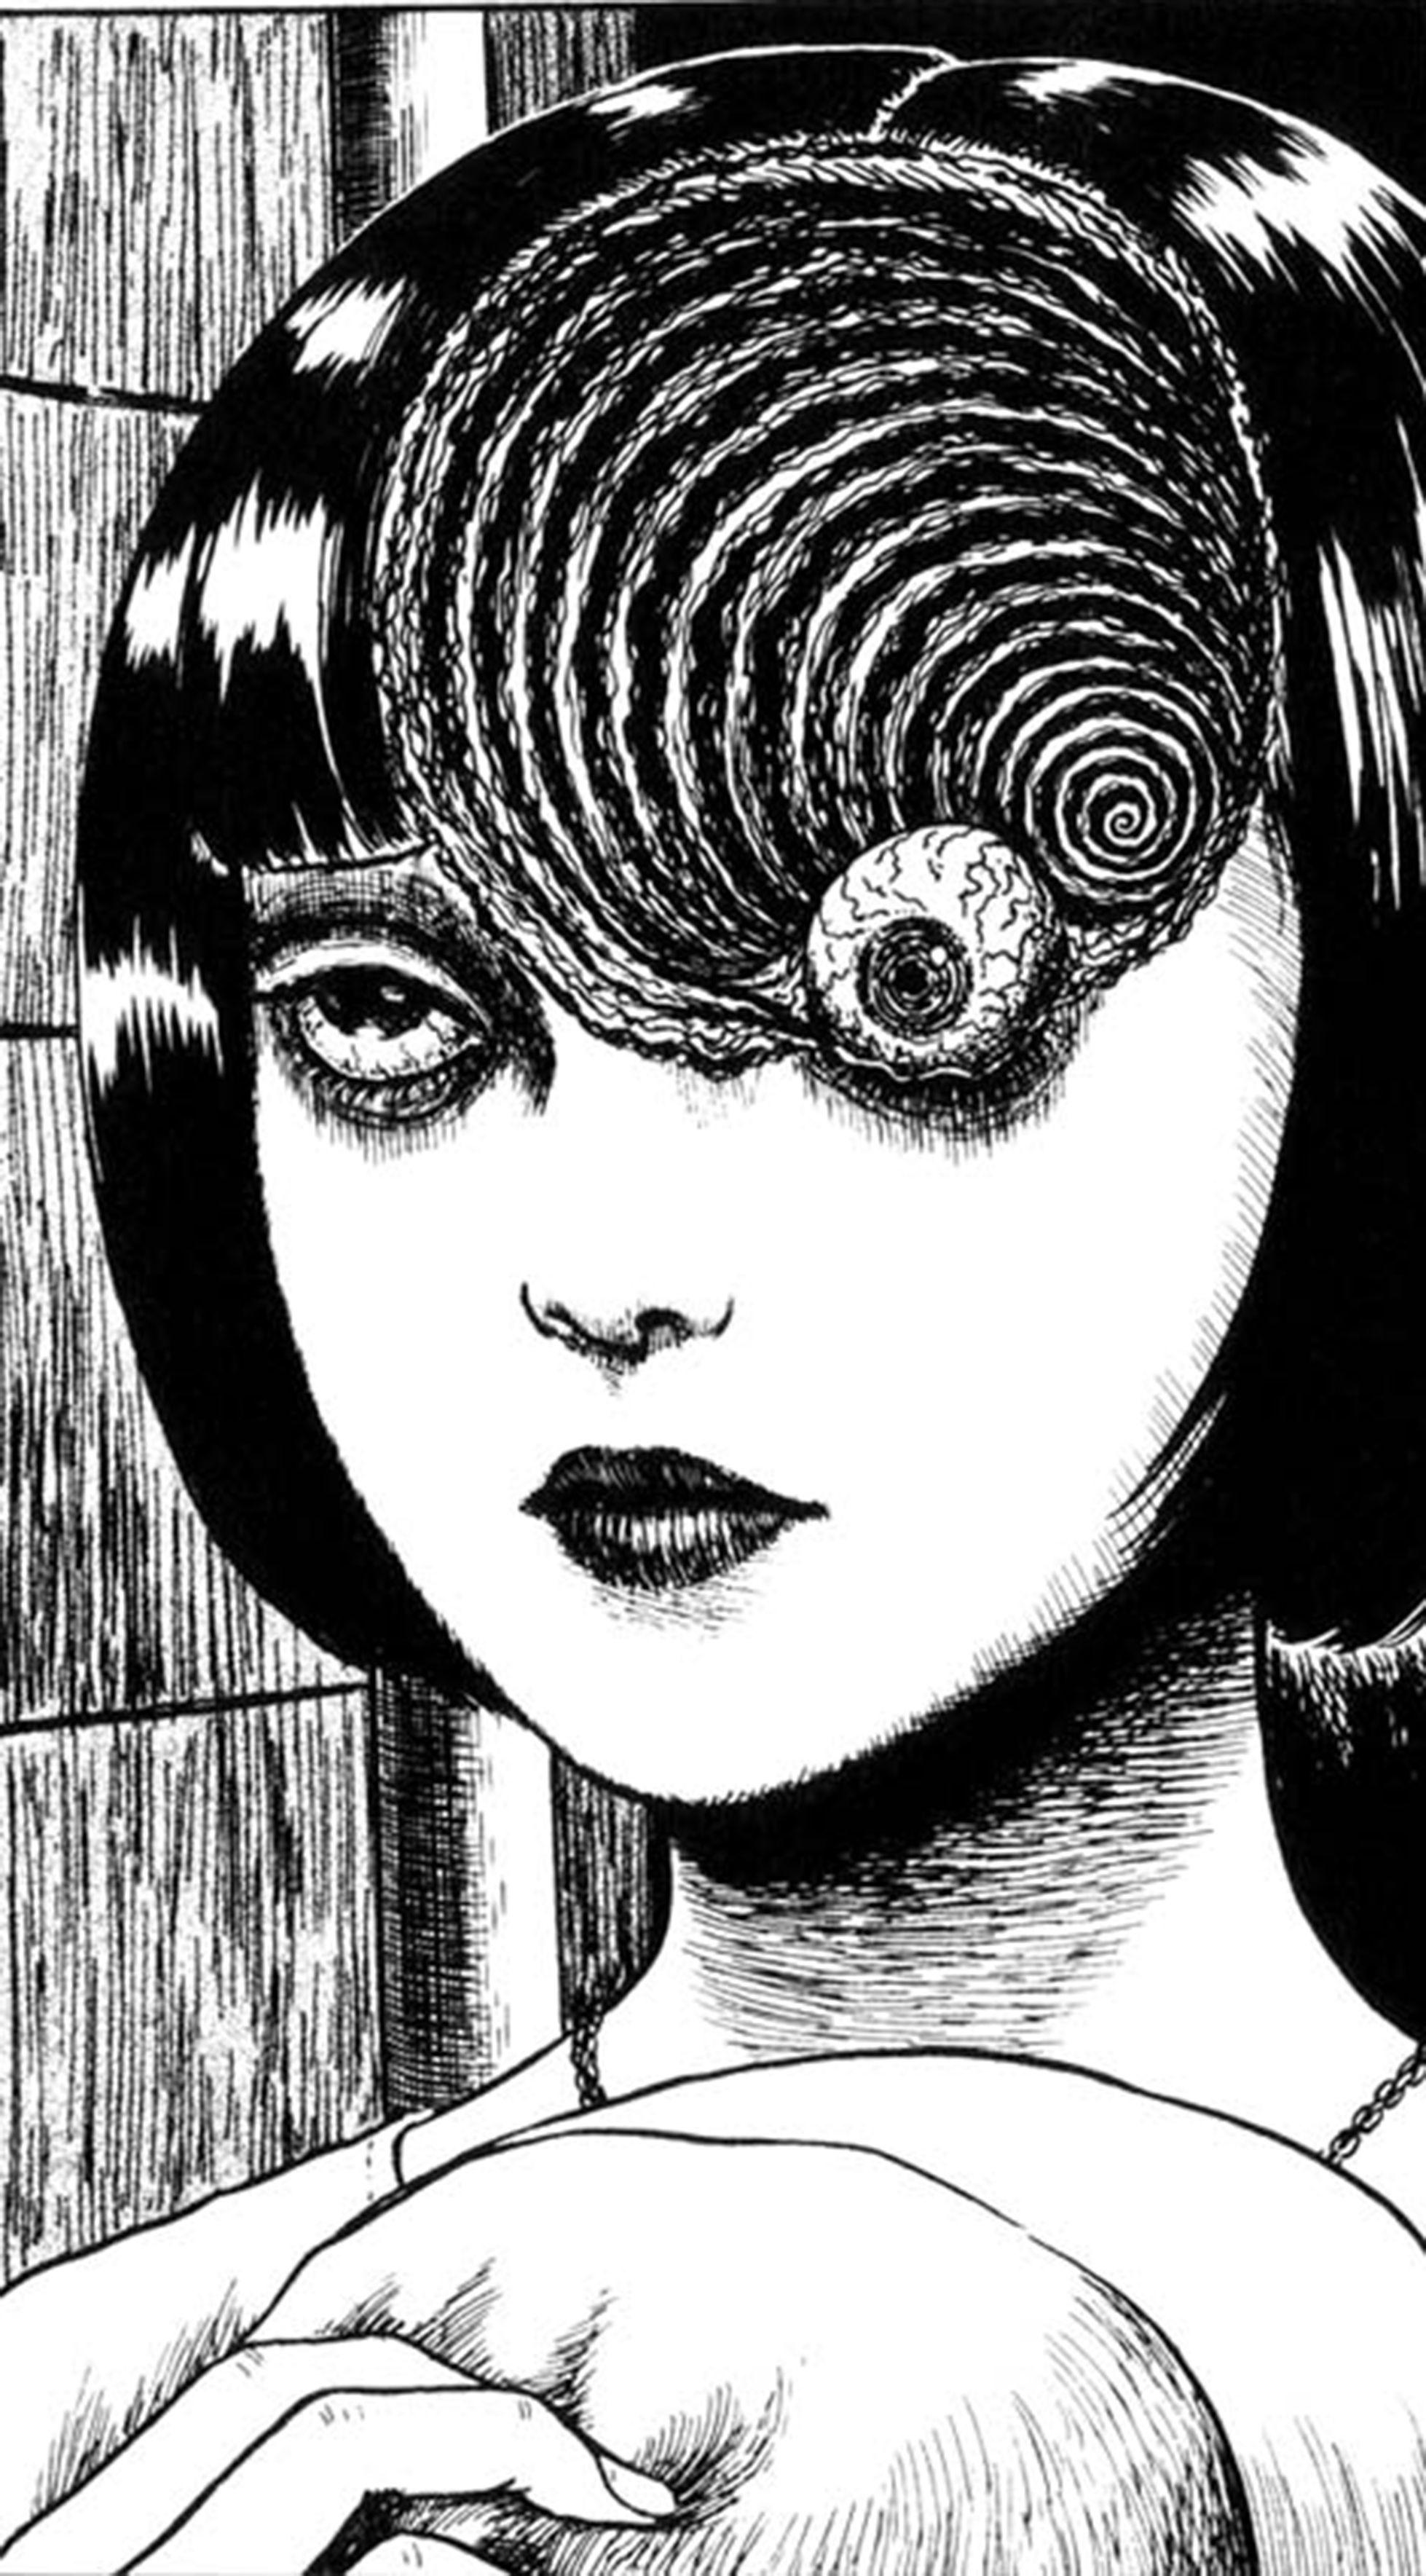 Uzumaki de Junji Ito Phone wallpaper in 2019 Migraine art 1958x3537